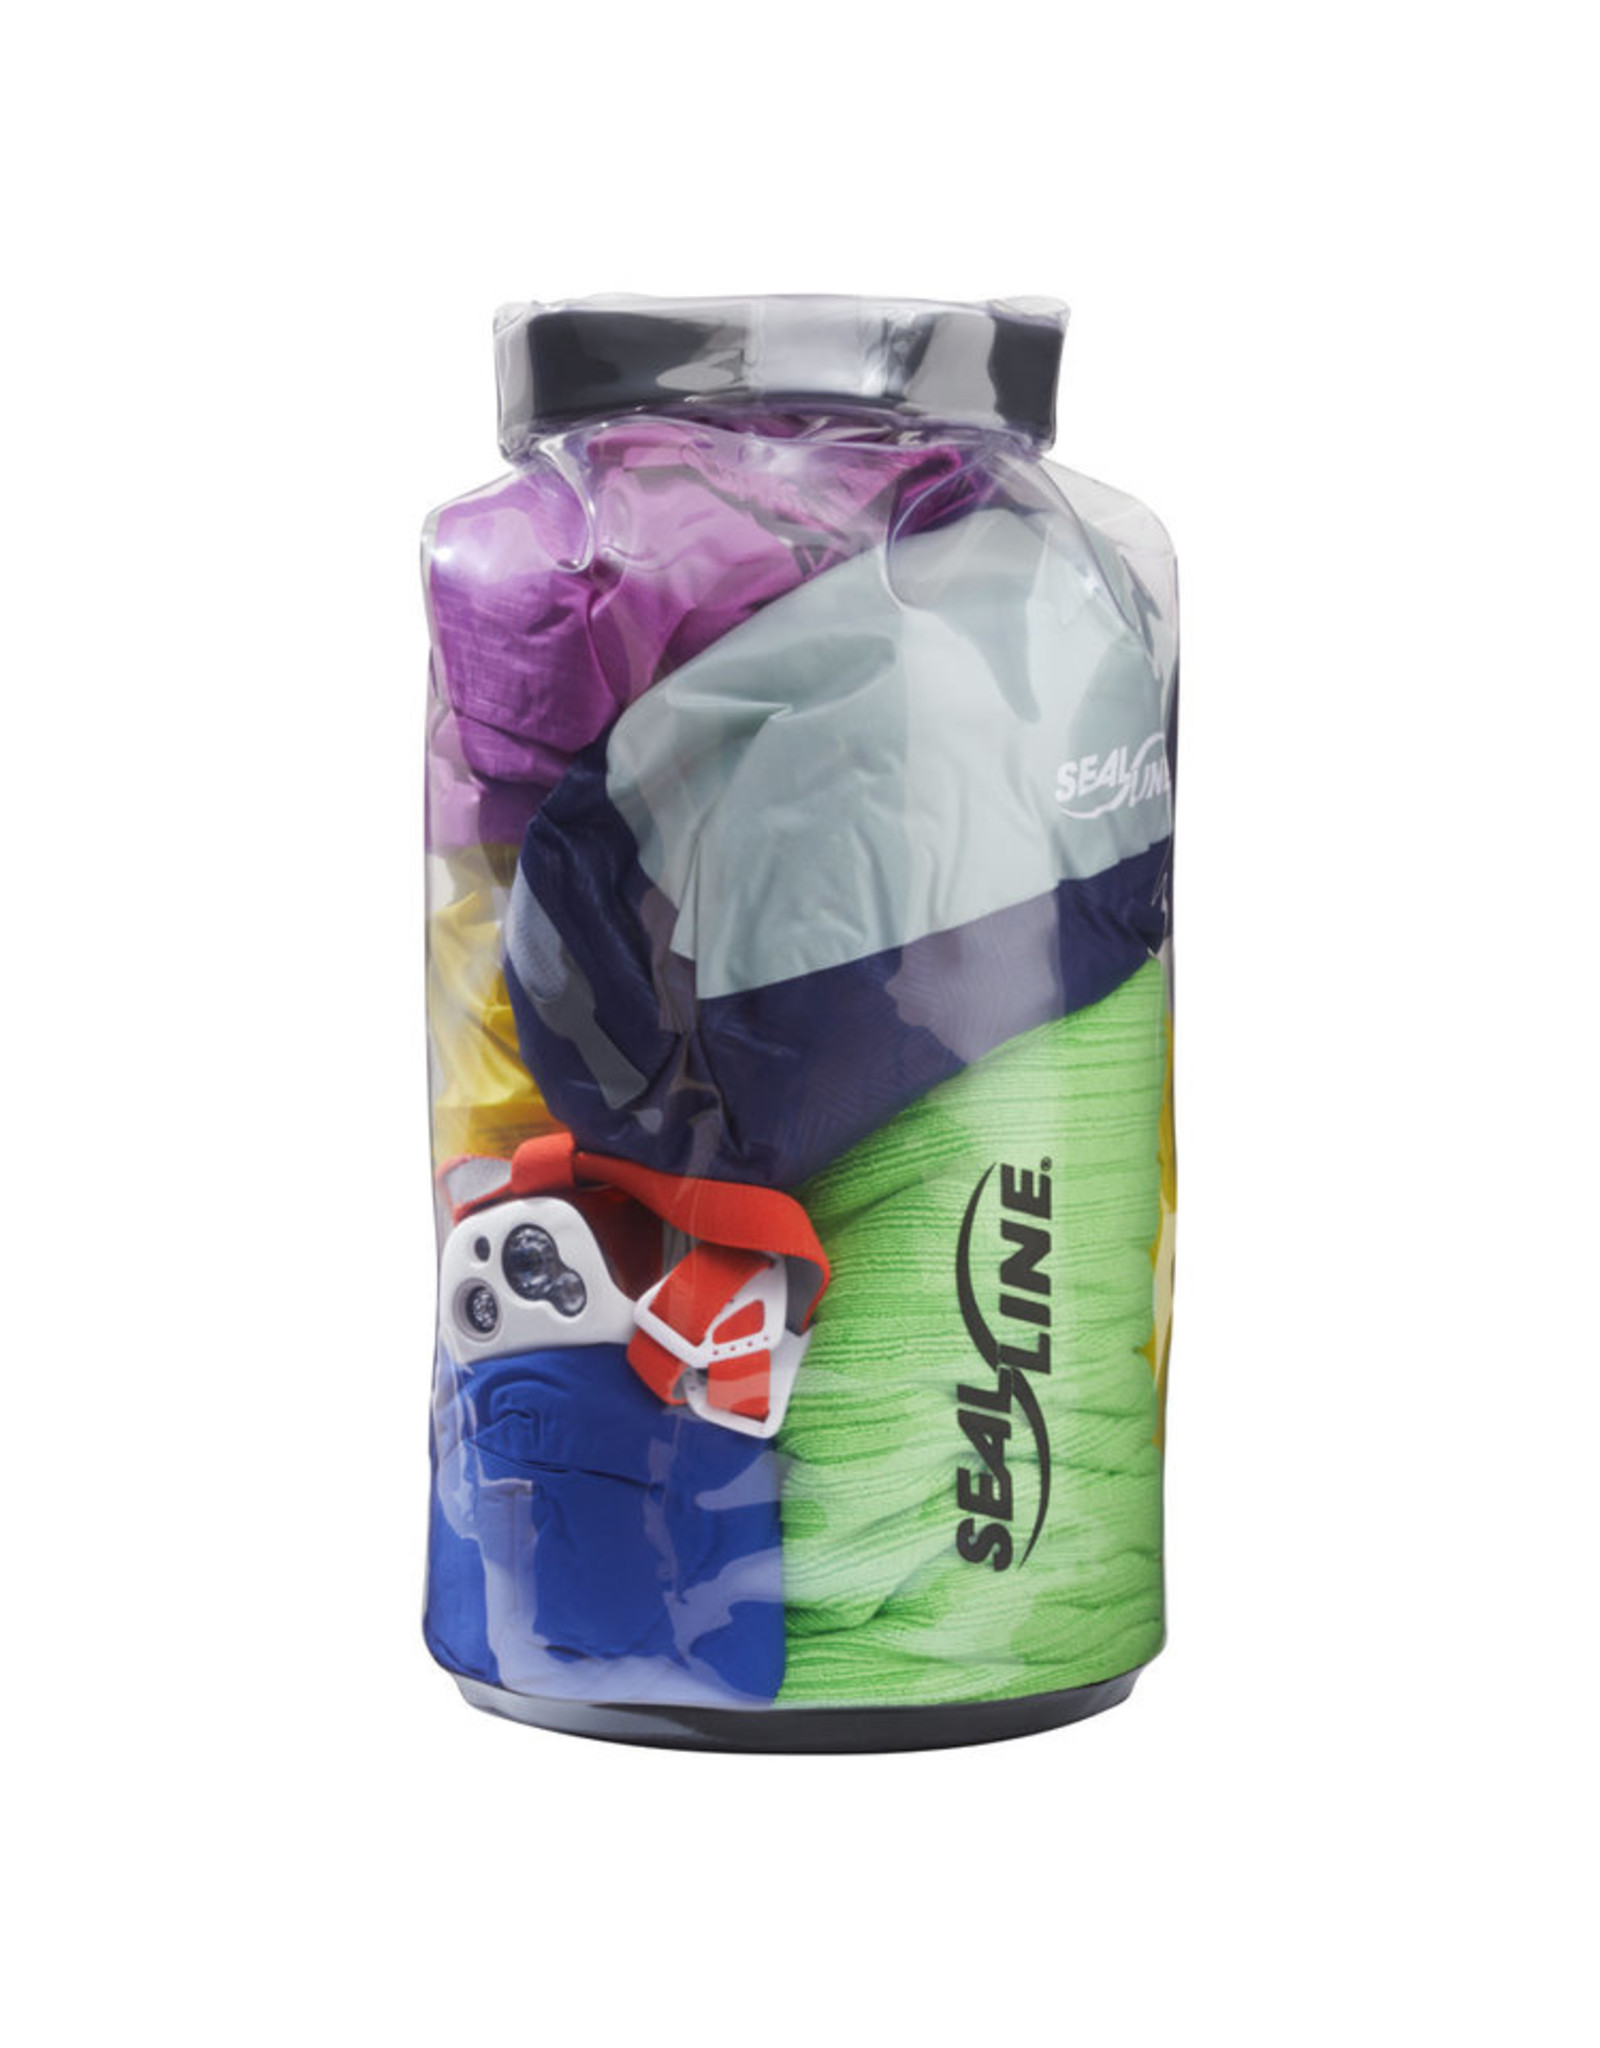 SealLine SealLine 10L Baja View Dry Bag Clear